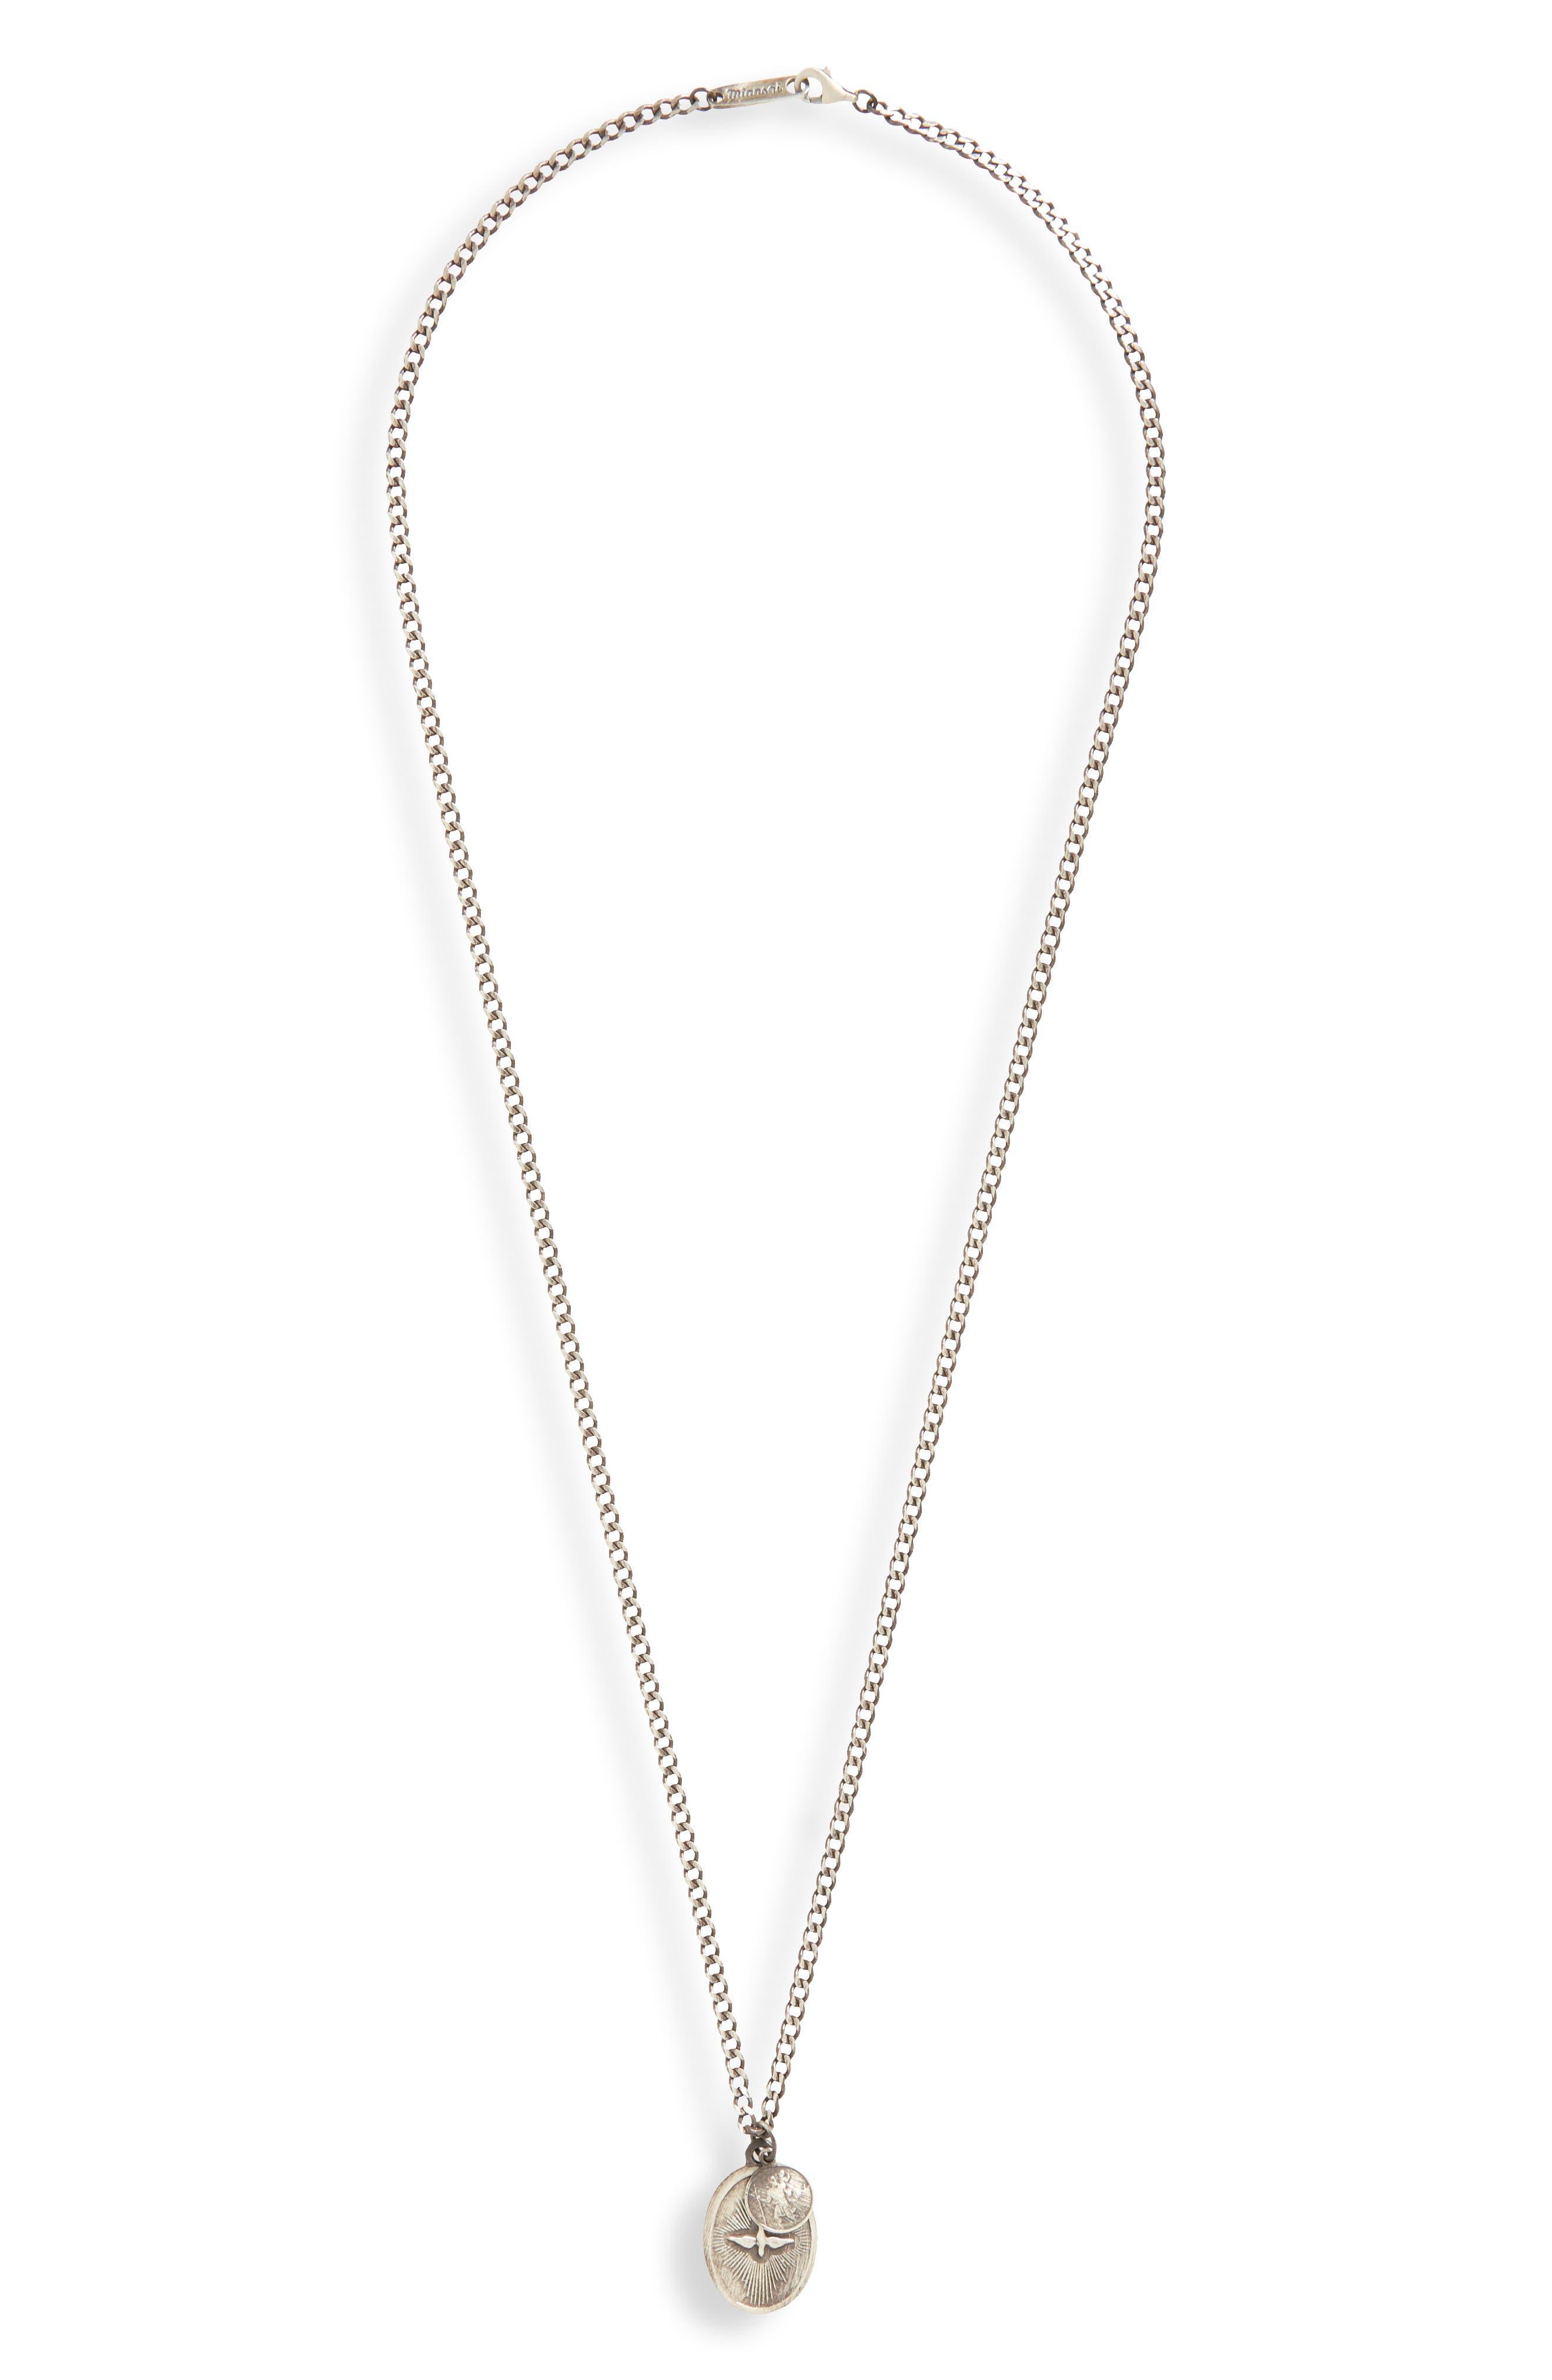 Dove Pendant Necklace,                         Main,                         color, Silver